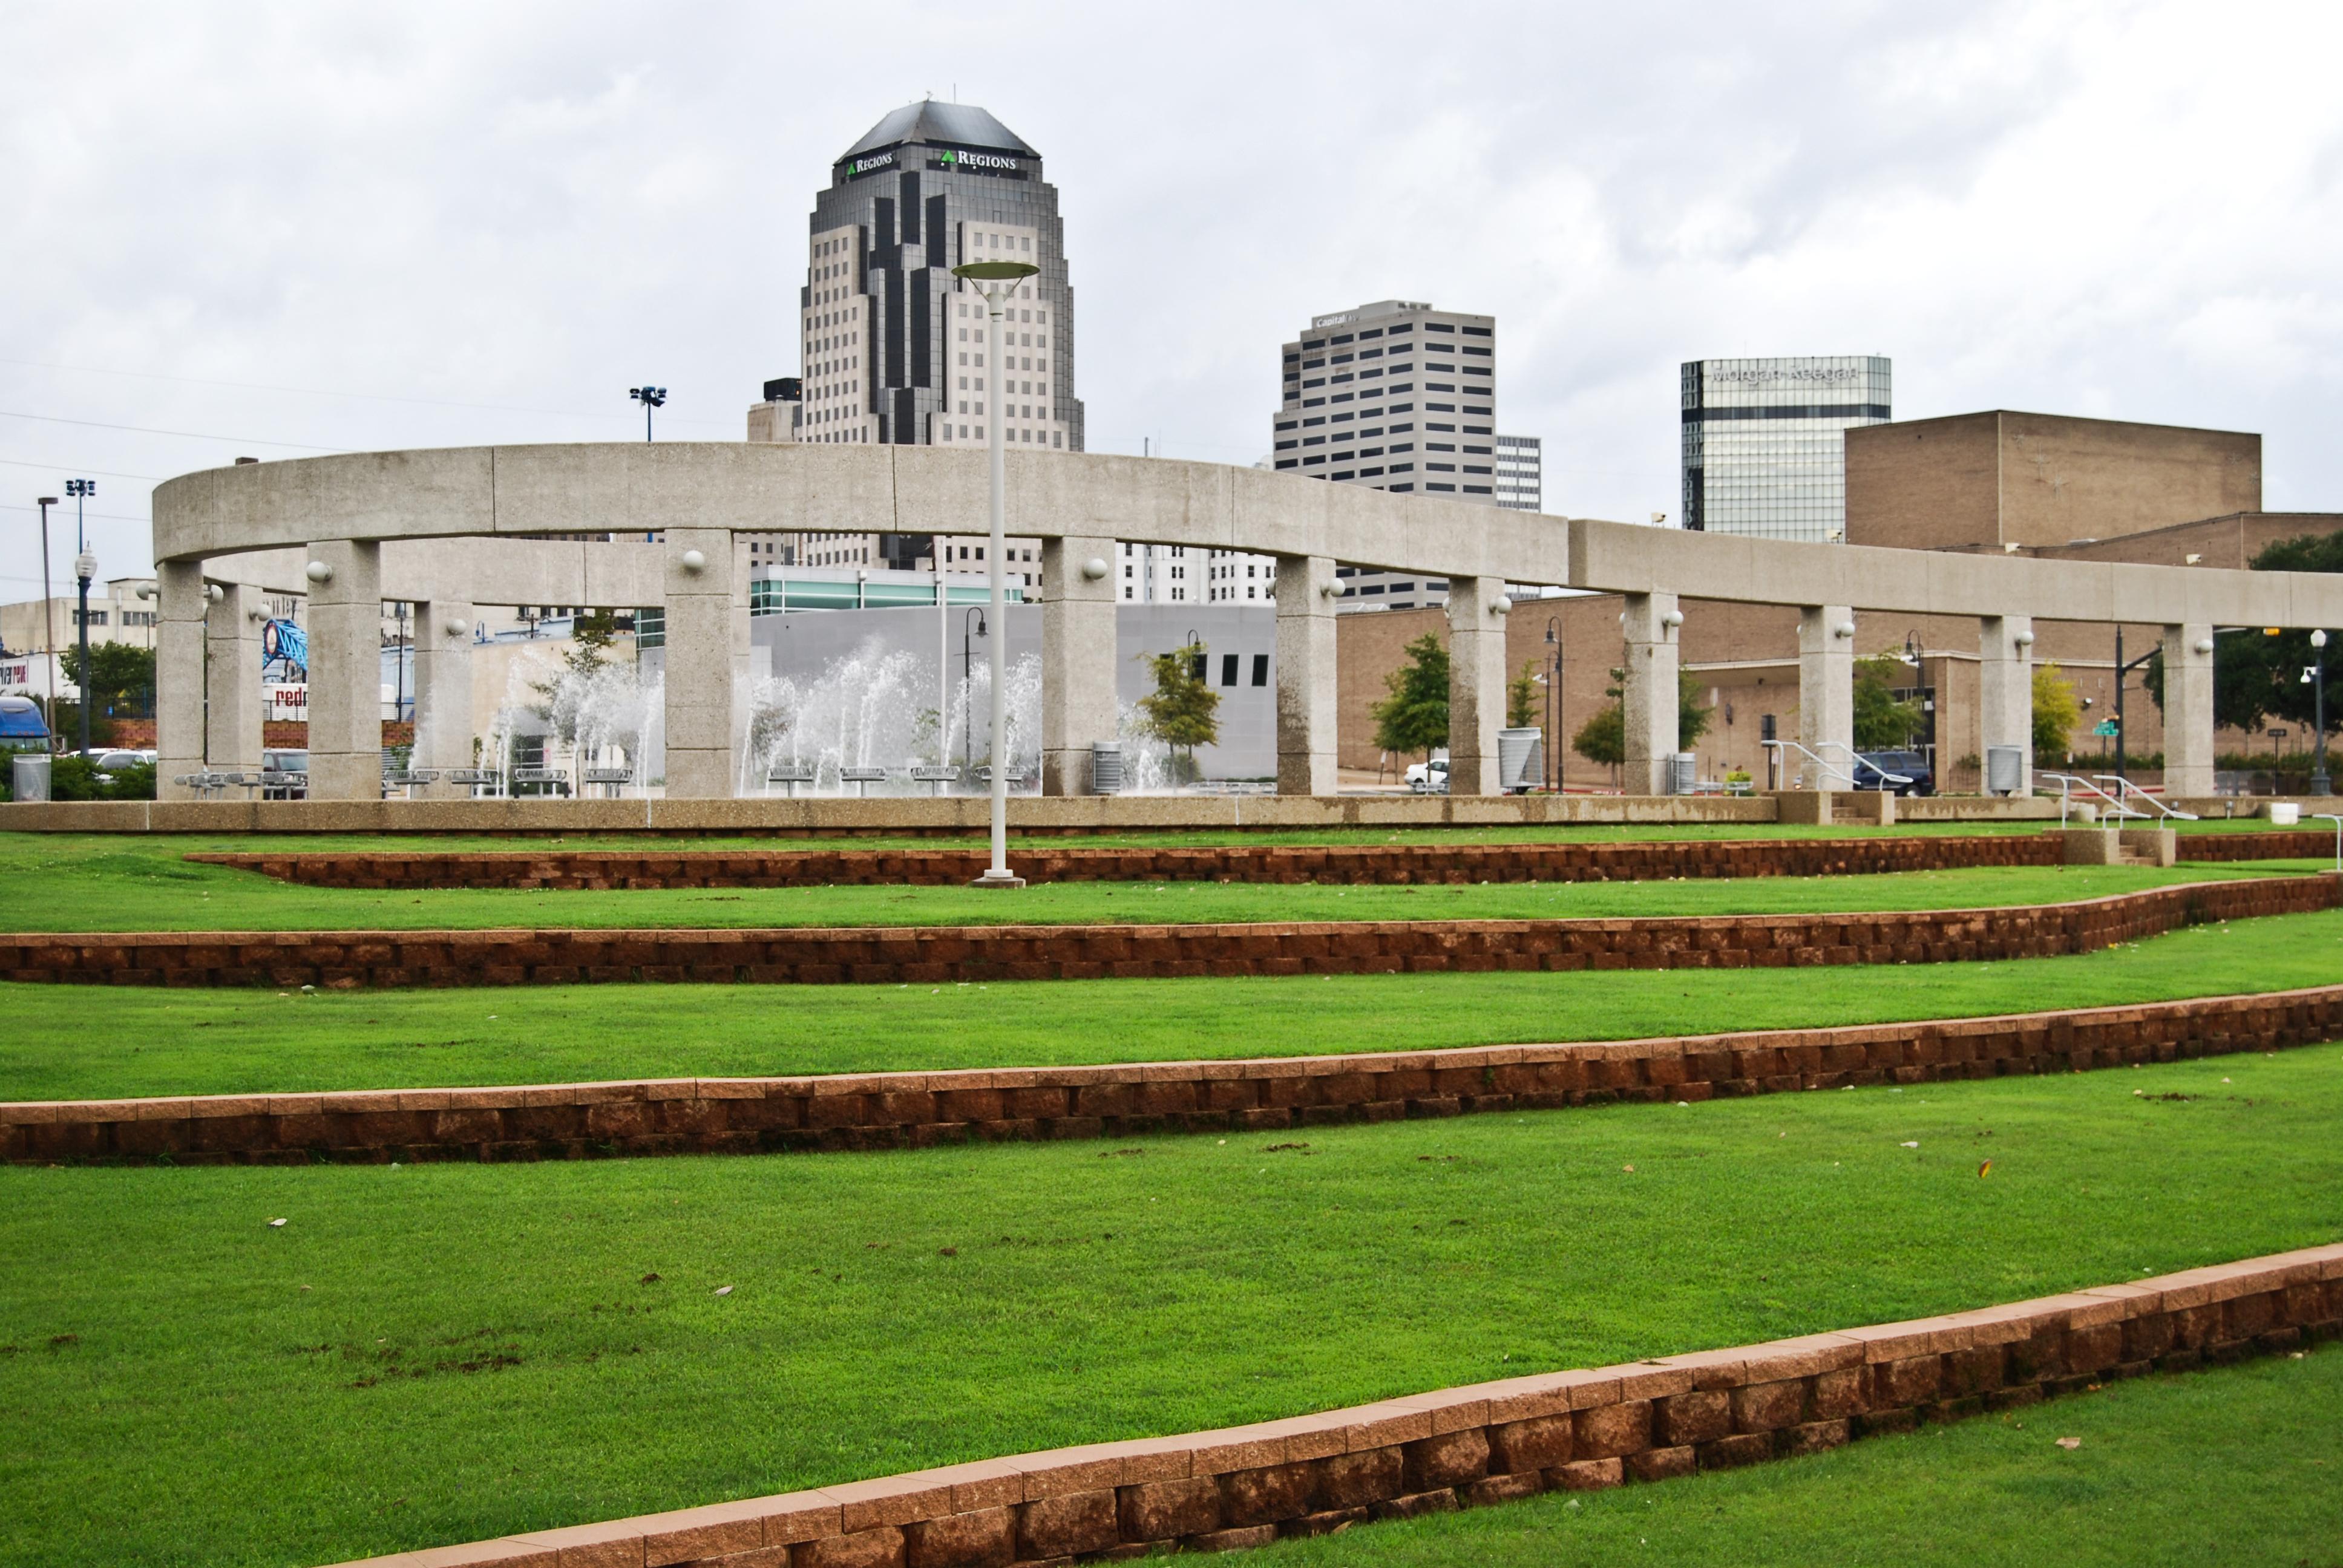 Riverview Theater Shreveport Louisiana Wikipedia